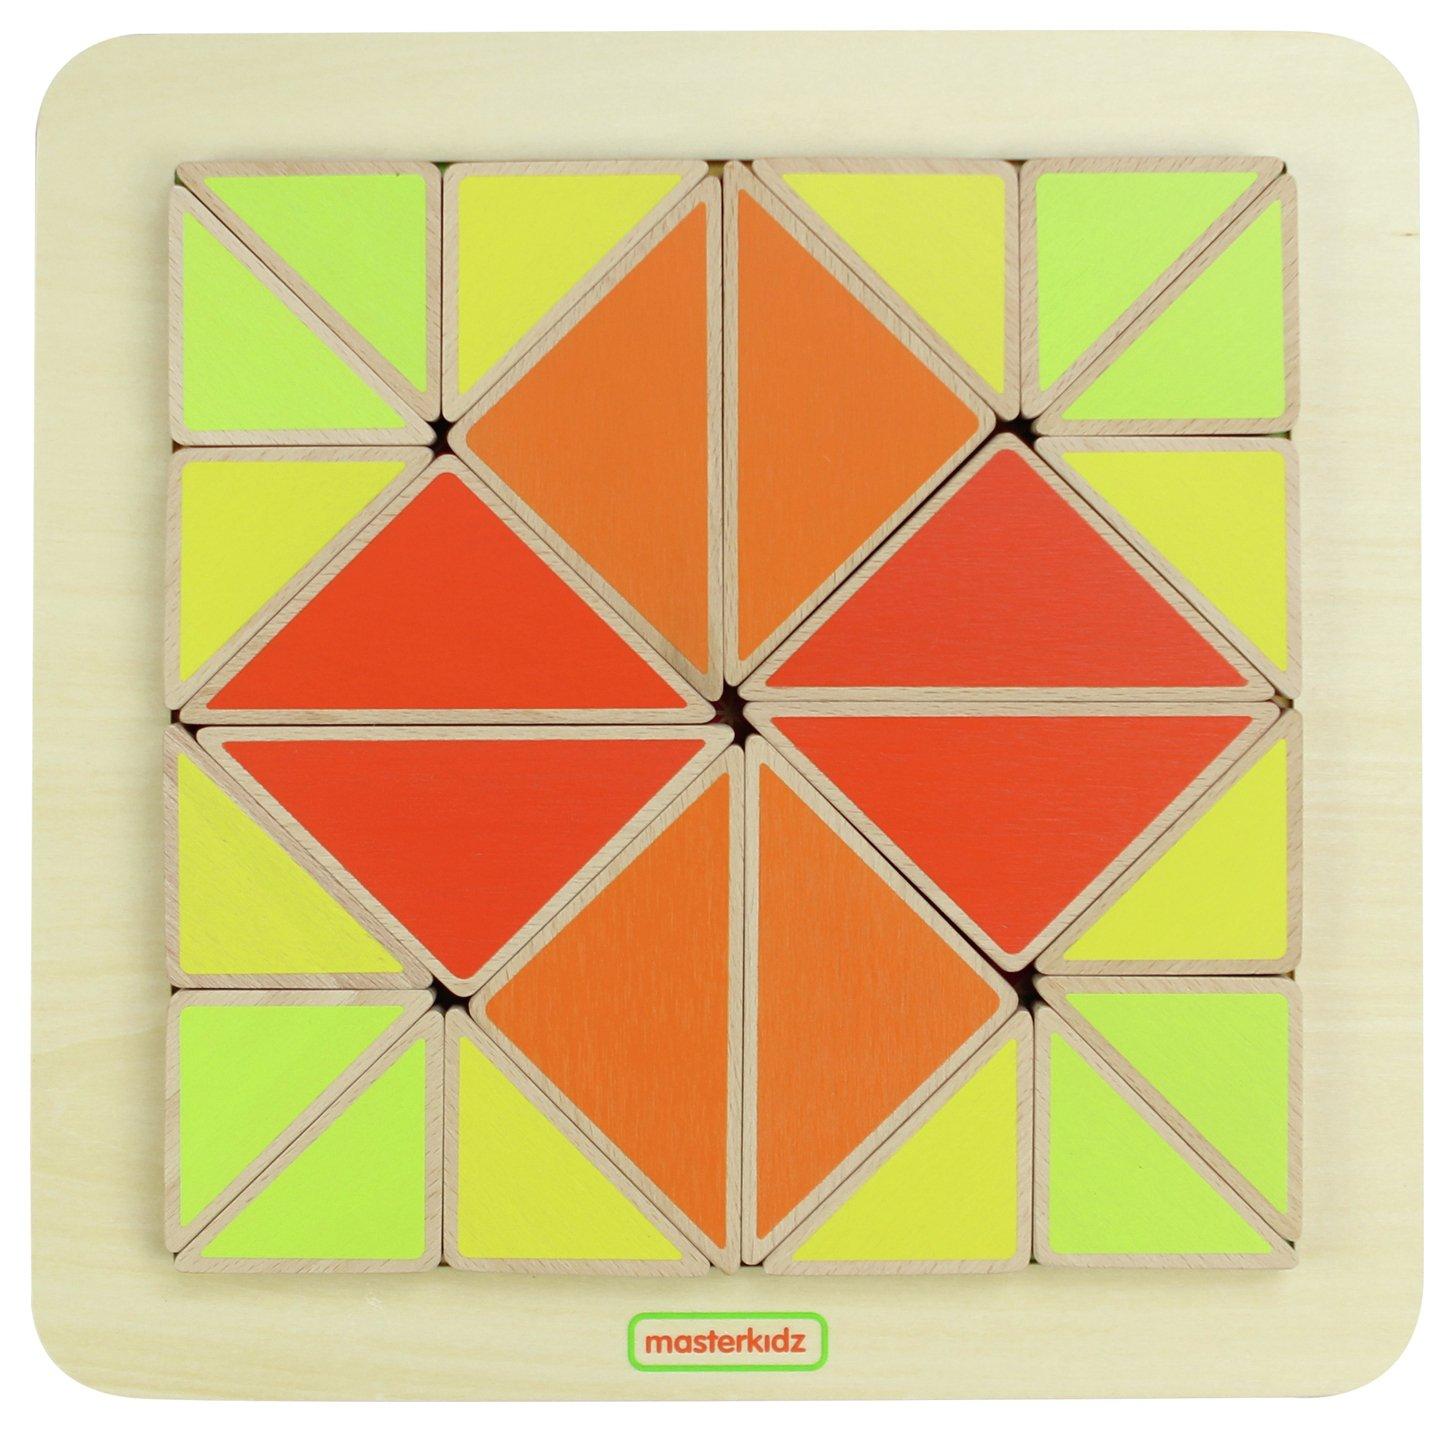 masterkidz-cross-mosaic-puzzle